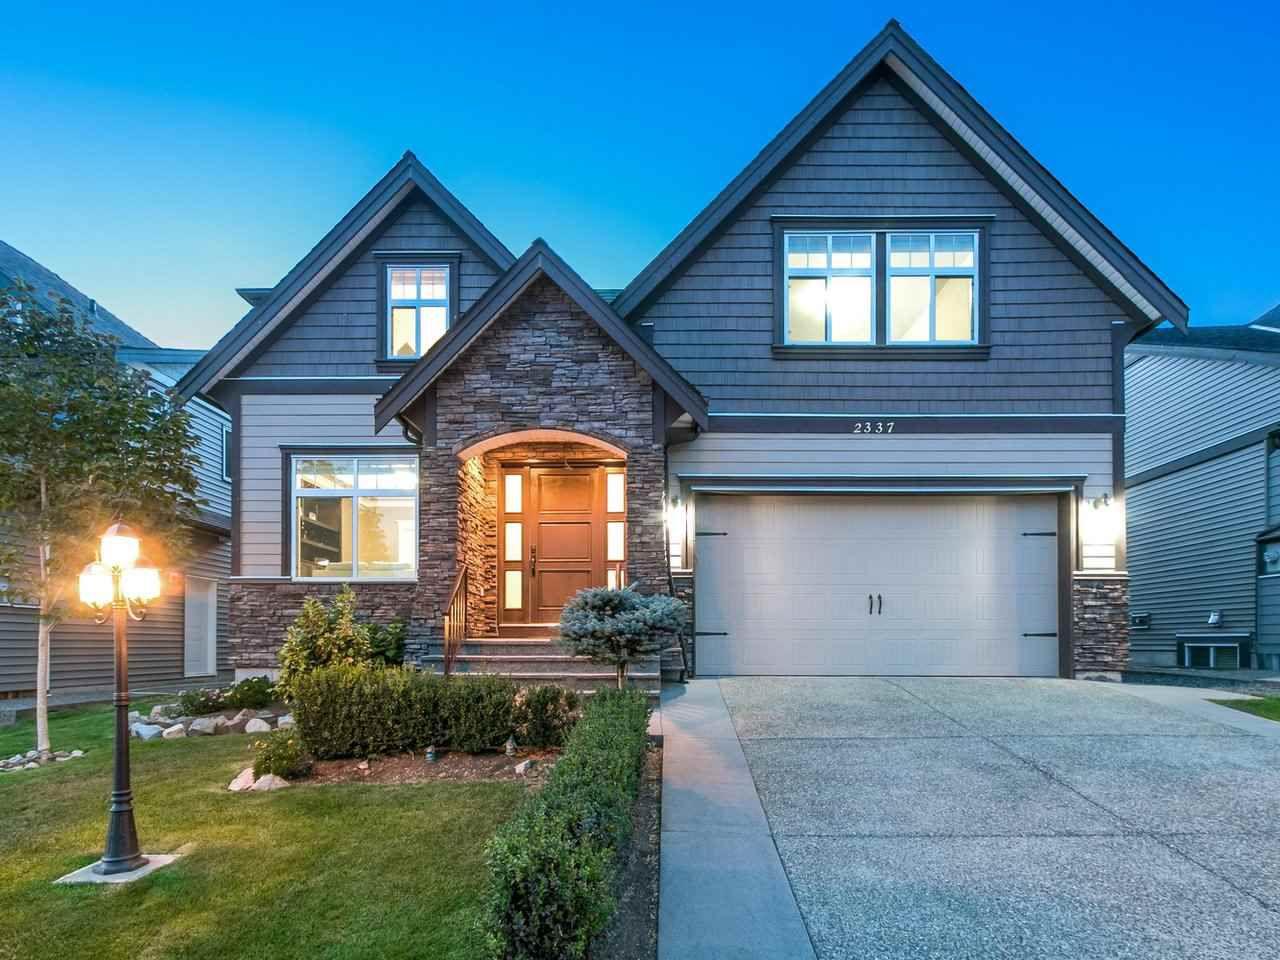 Main Photo: 2337 MERLOT Boulevard in Abbotsford: Aberdeen House for sale : MLS®# R2200568